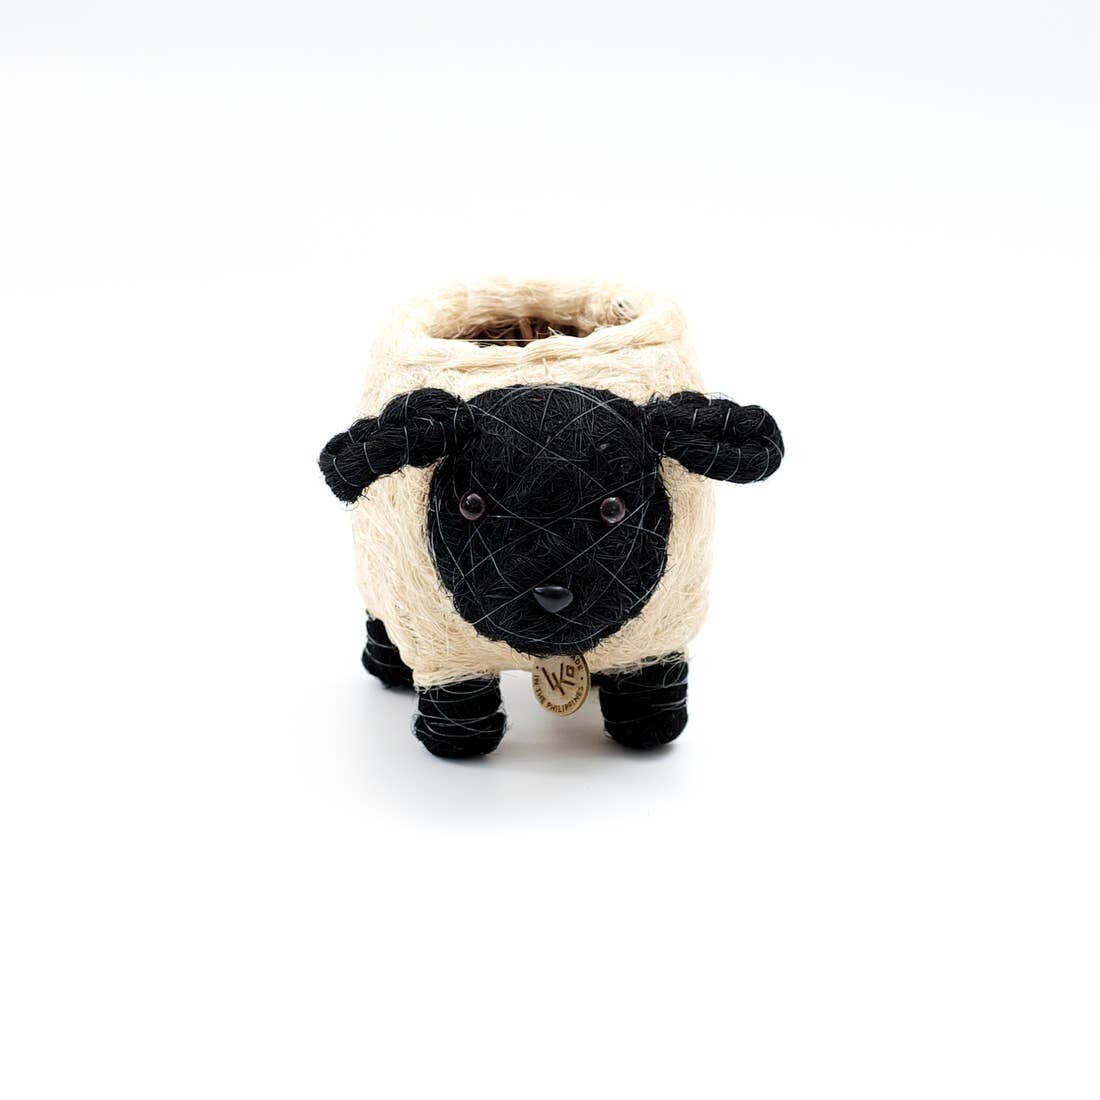 Sheep Animal Planter by LIKHA